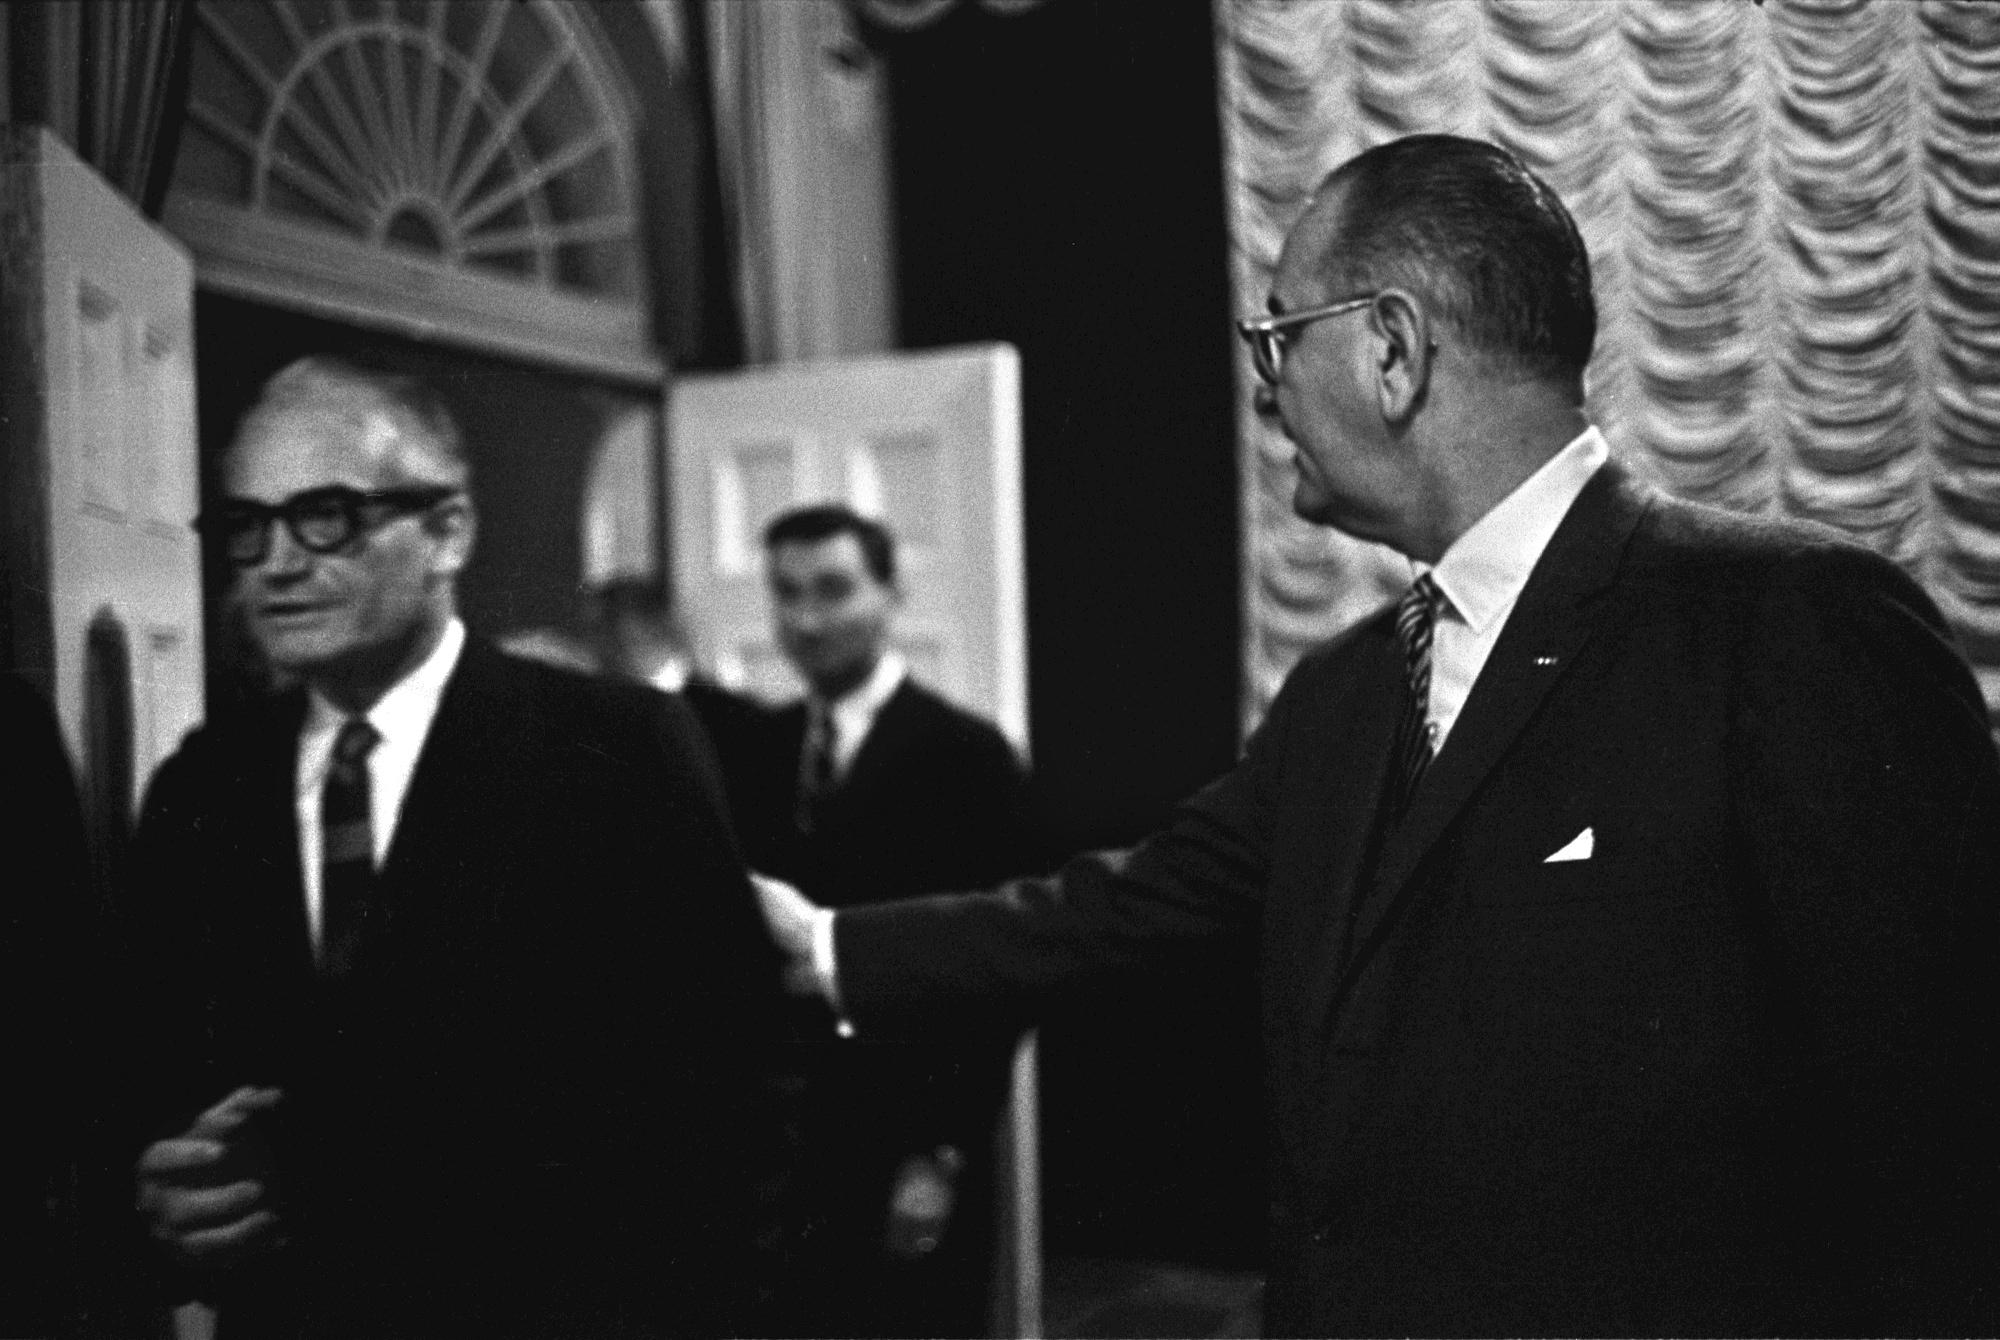 President Johnson and Senator Barry Goldwater